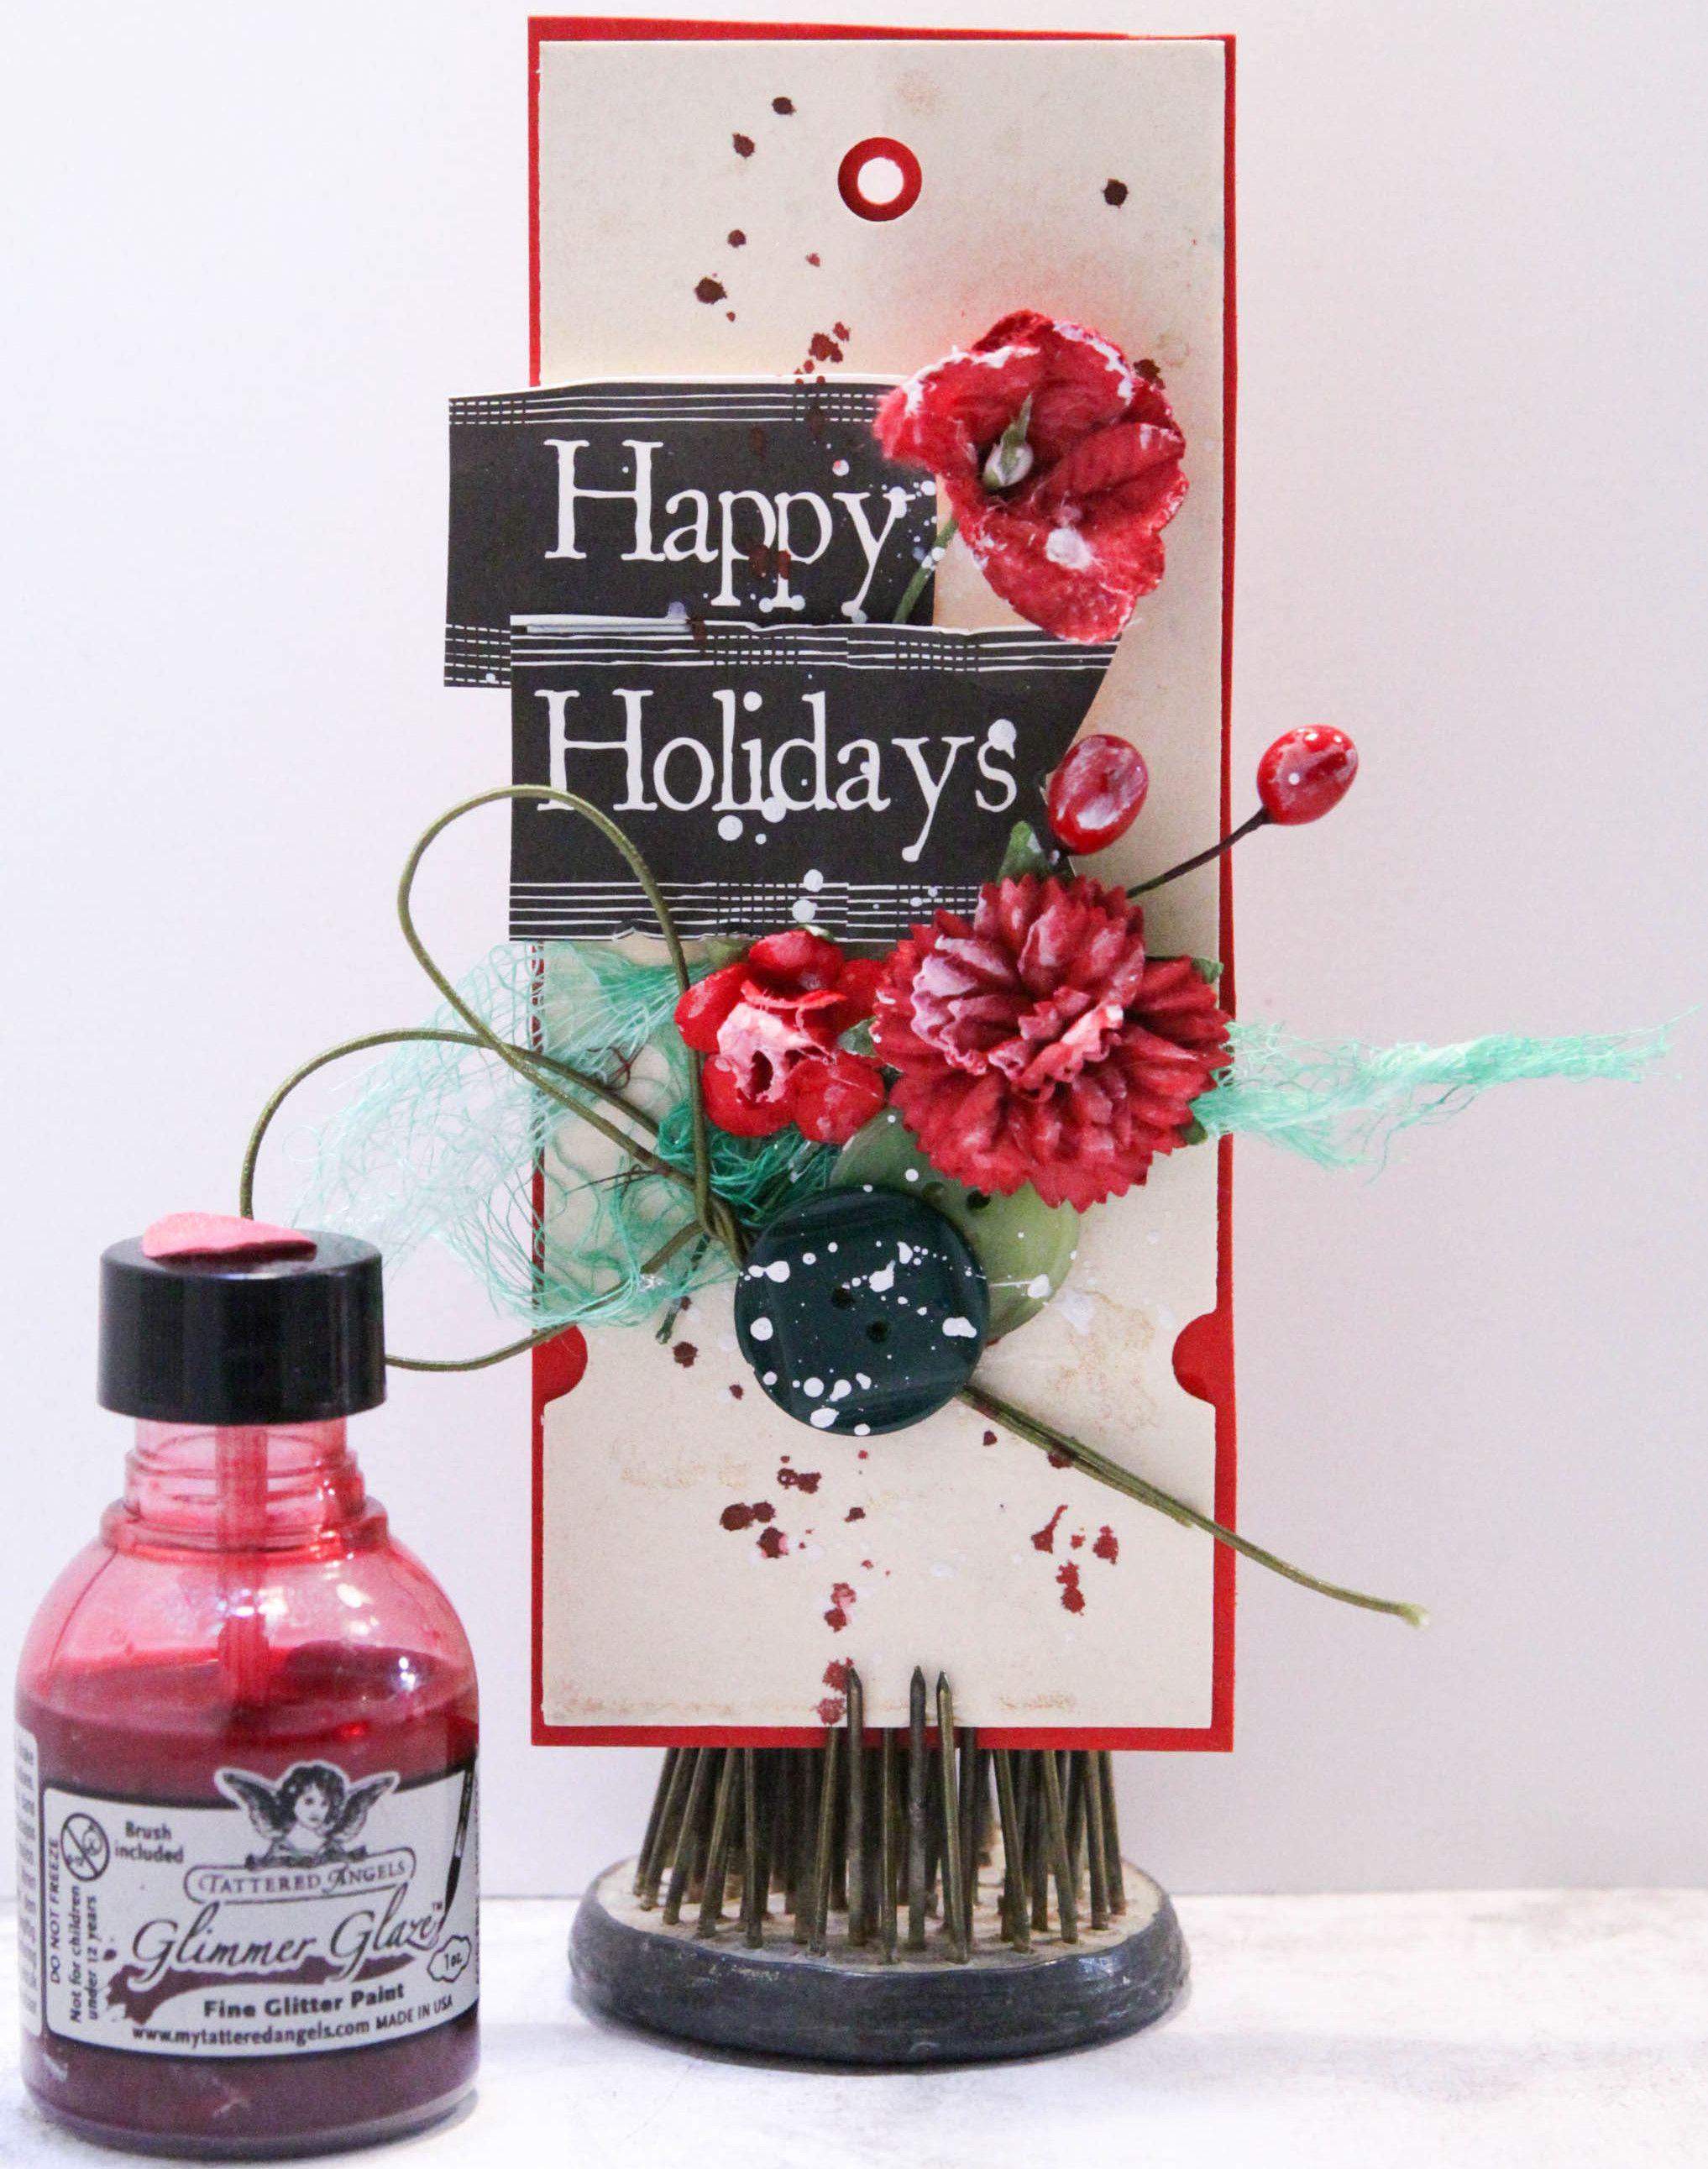 Happy Holiday Gift Tag